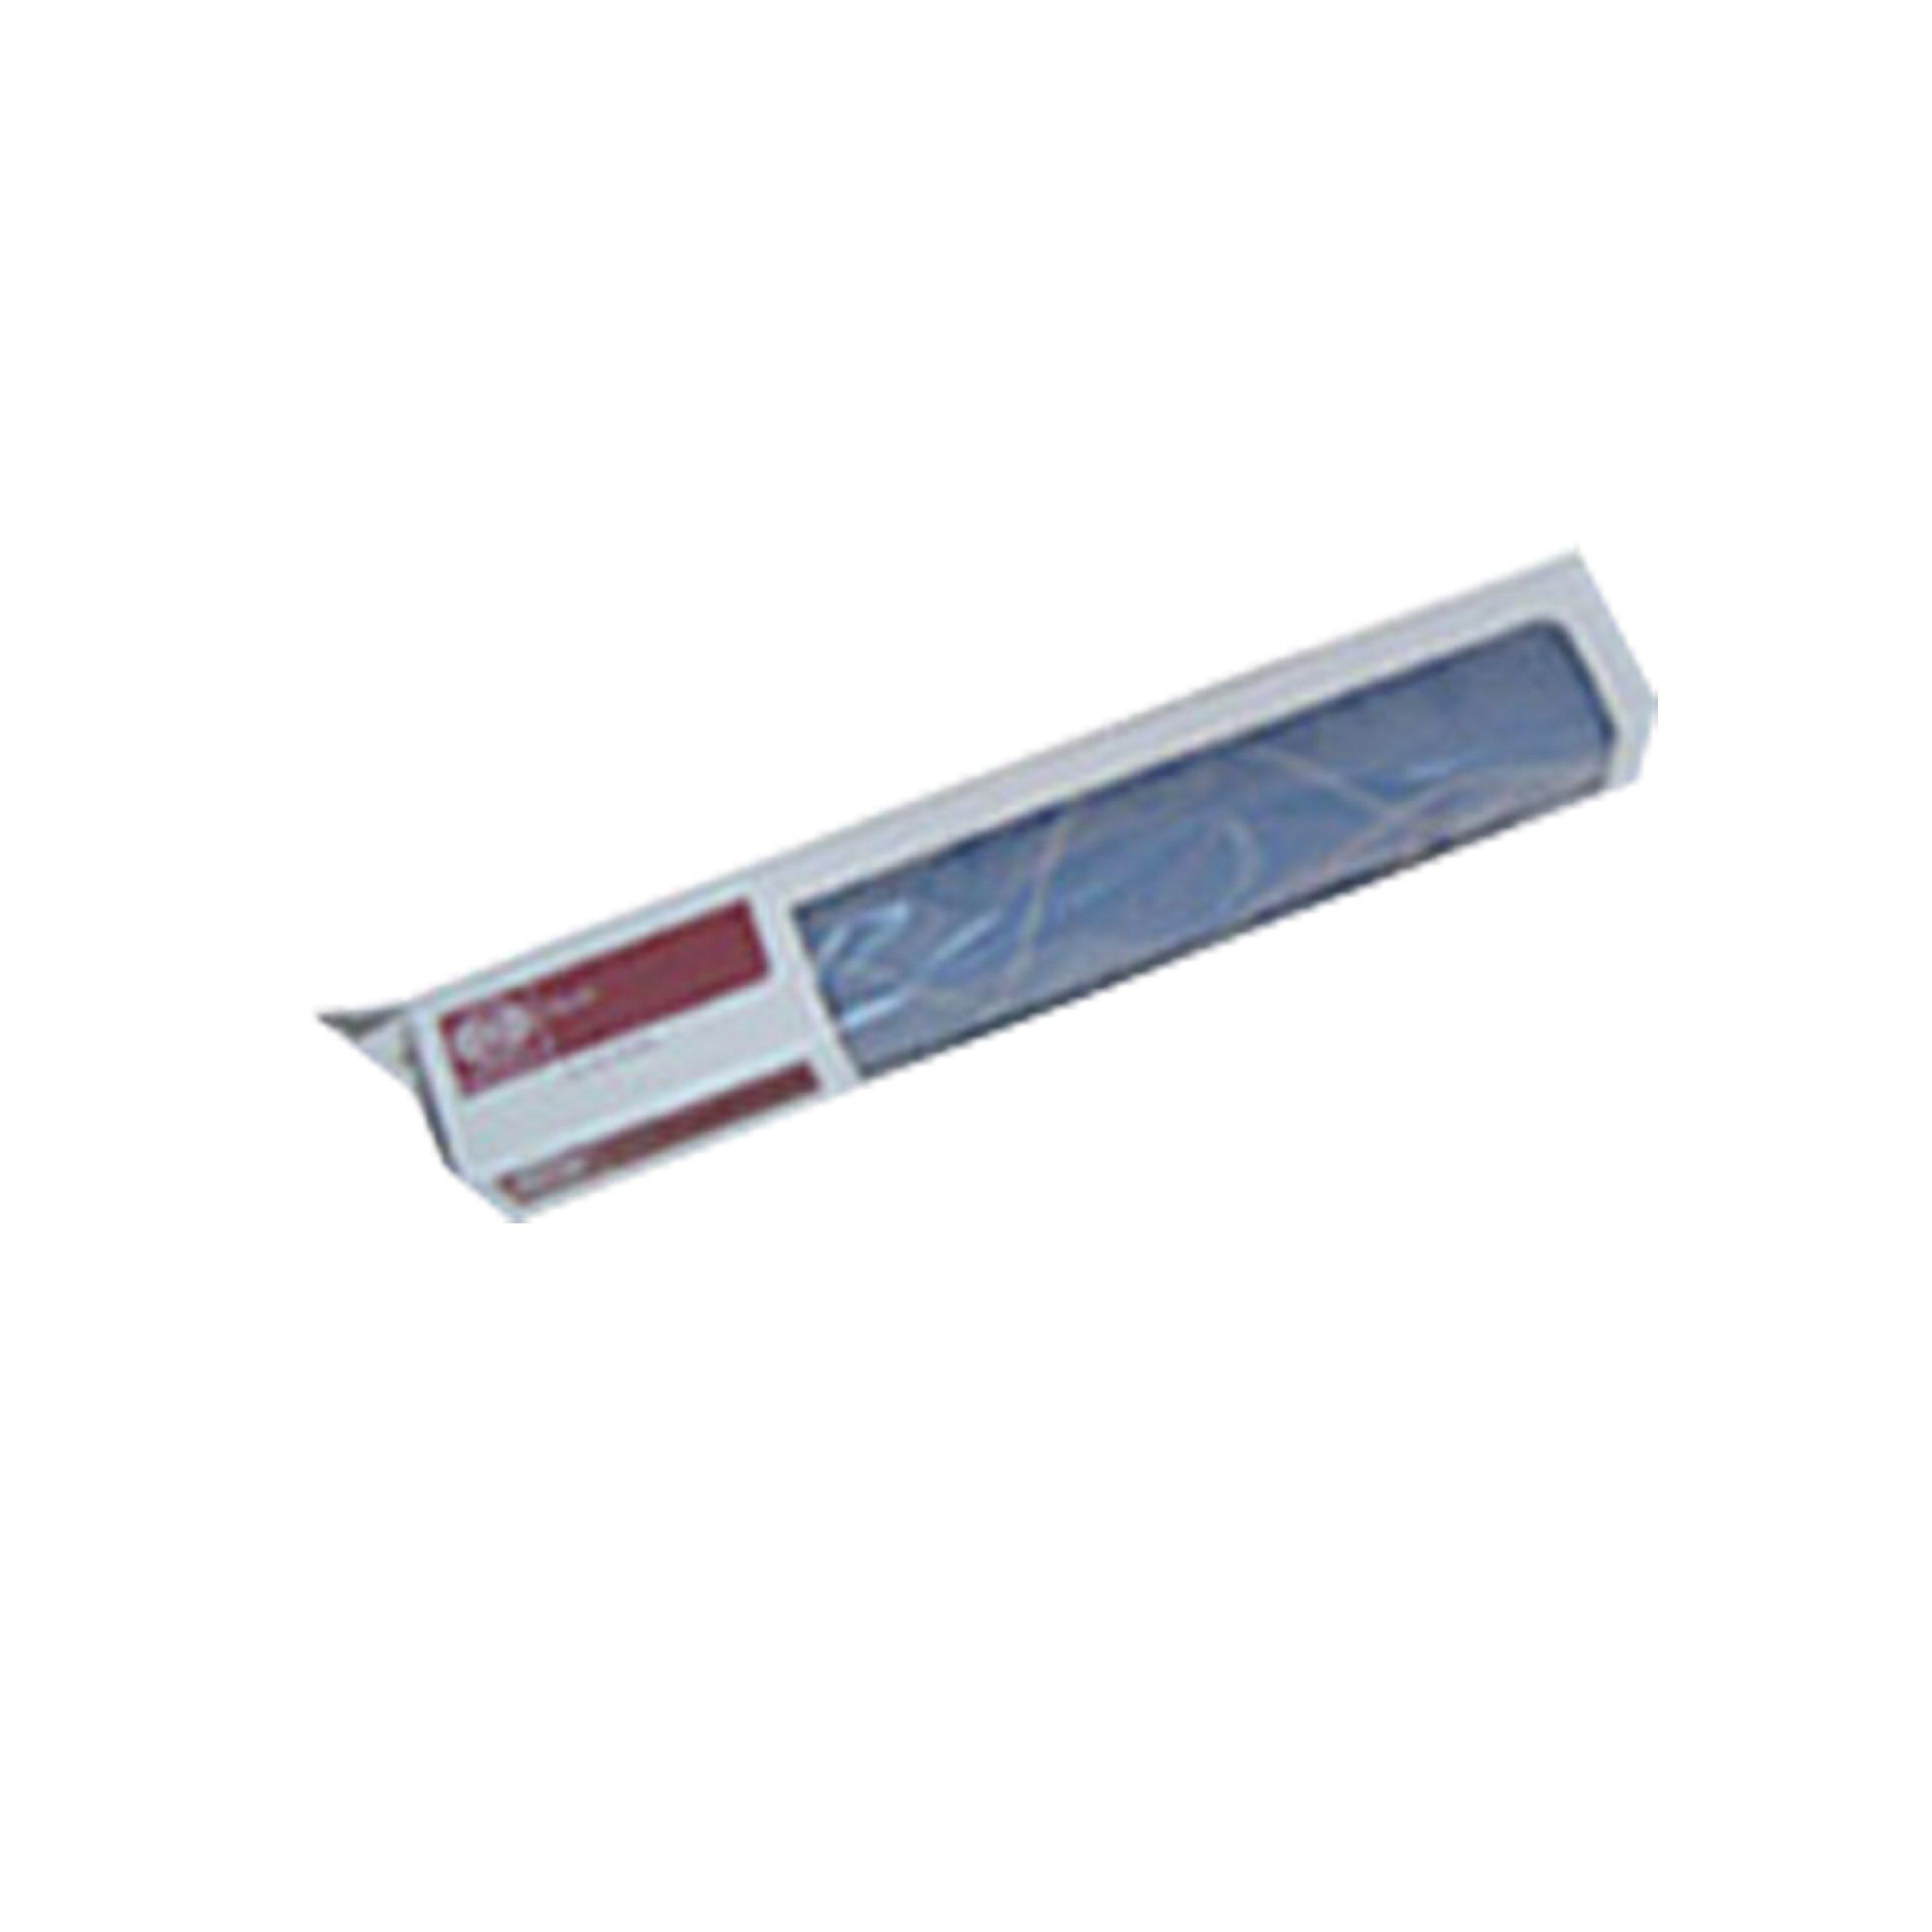 Sebo 7095ER02 Exhaust Microfilter for Felix Vacuum, Ice Blue